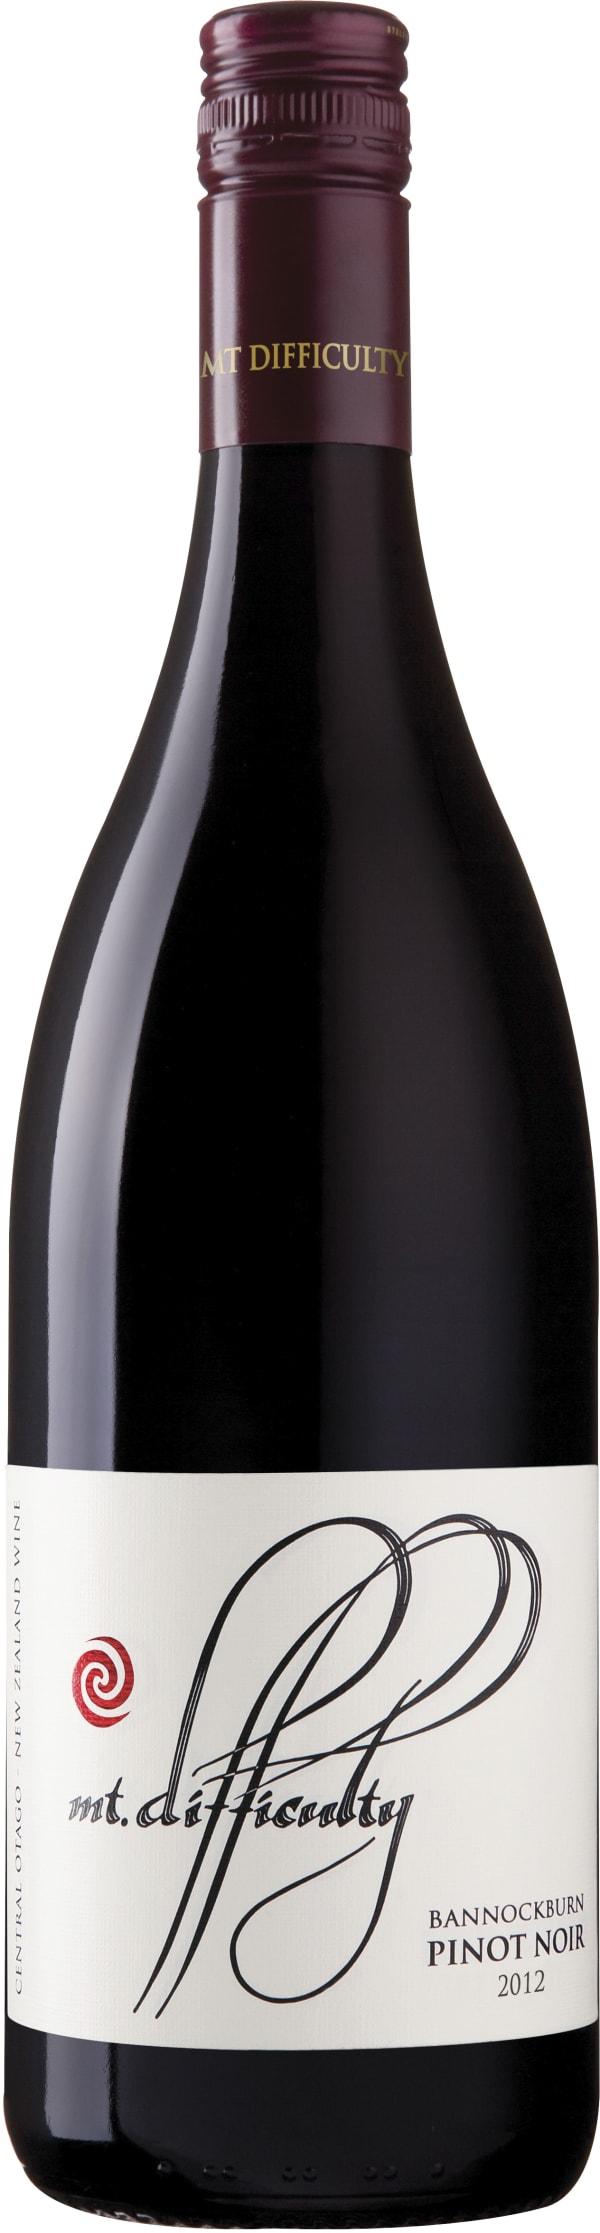 Mt Difficulty Bannockburn Pinot Noir 2012